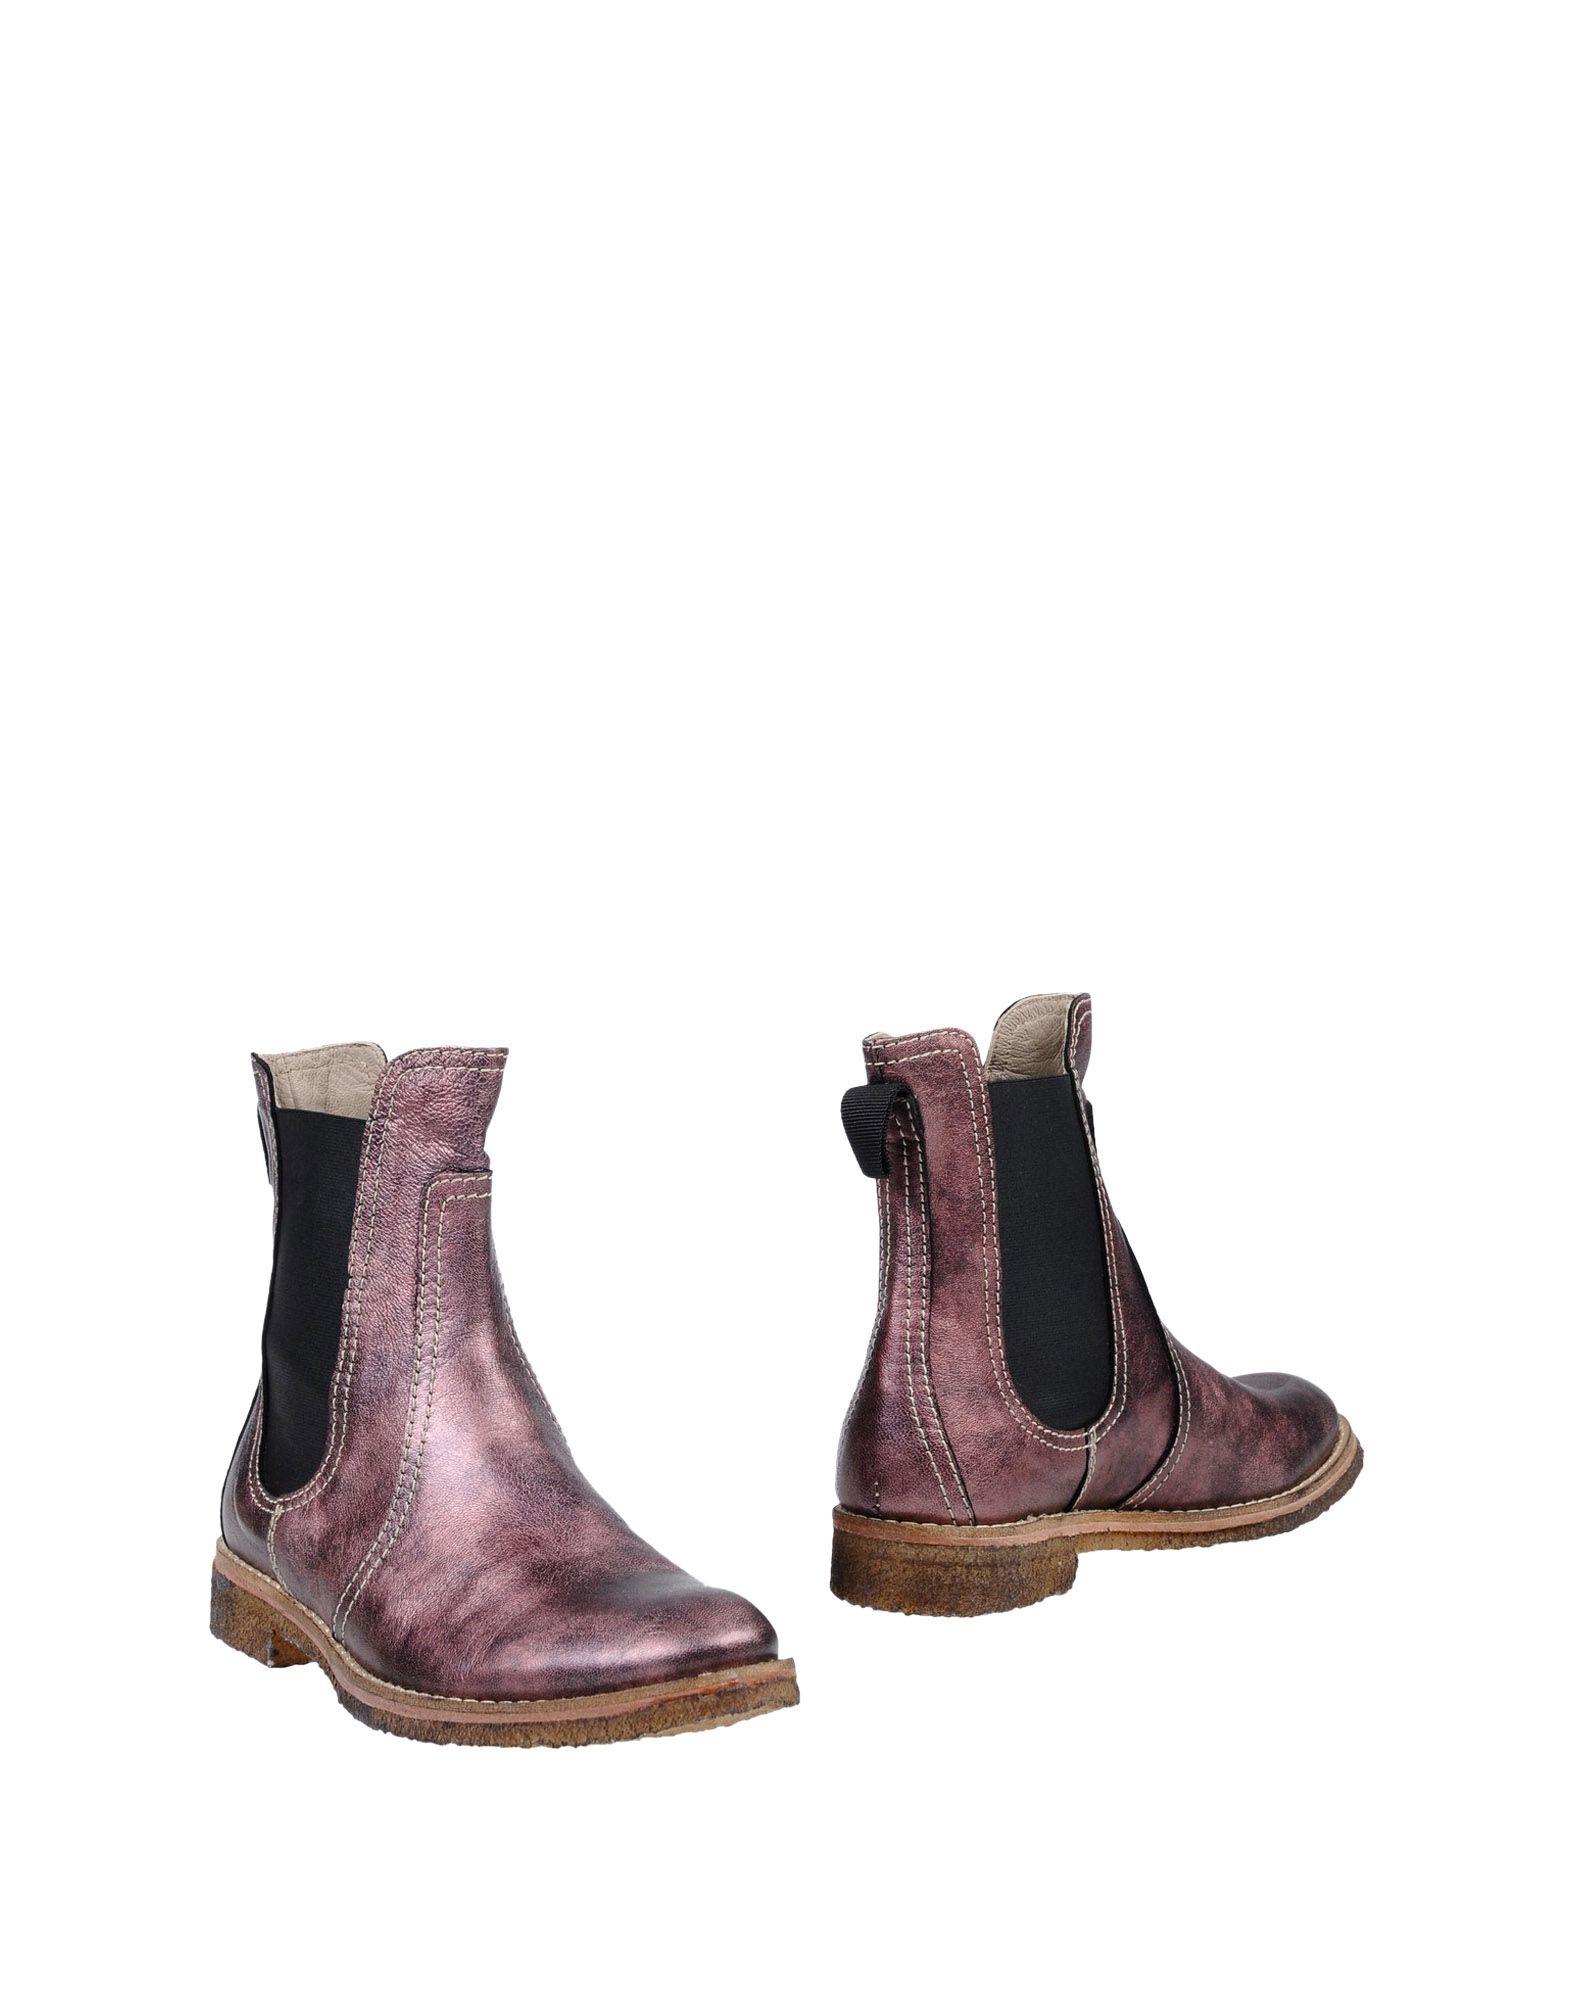 CANDICE COOPER Полусапоги и высокие ботинки ботинки cooper ботинки